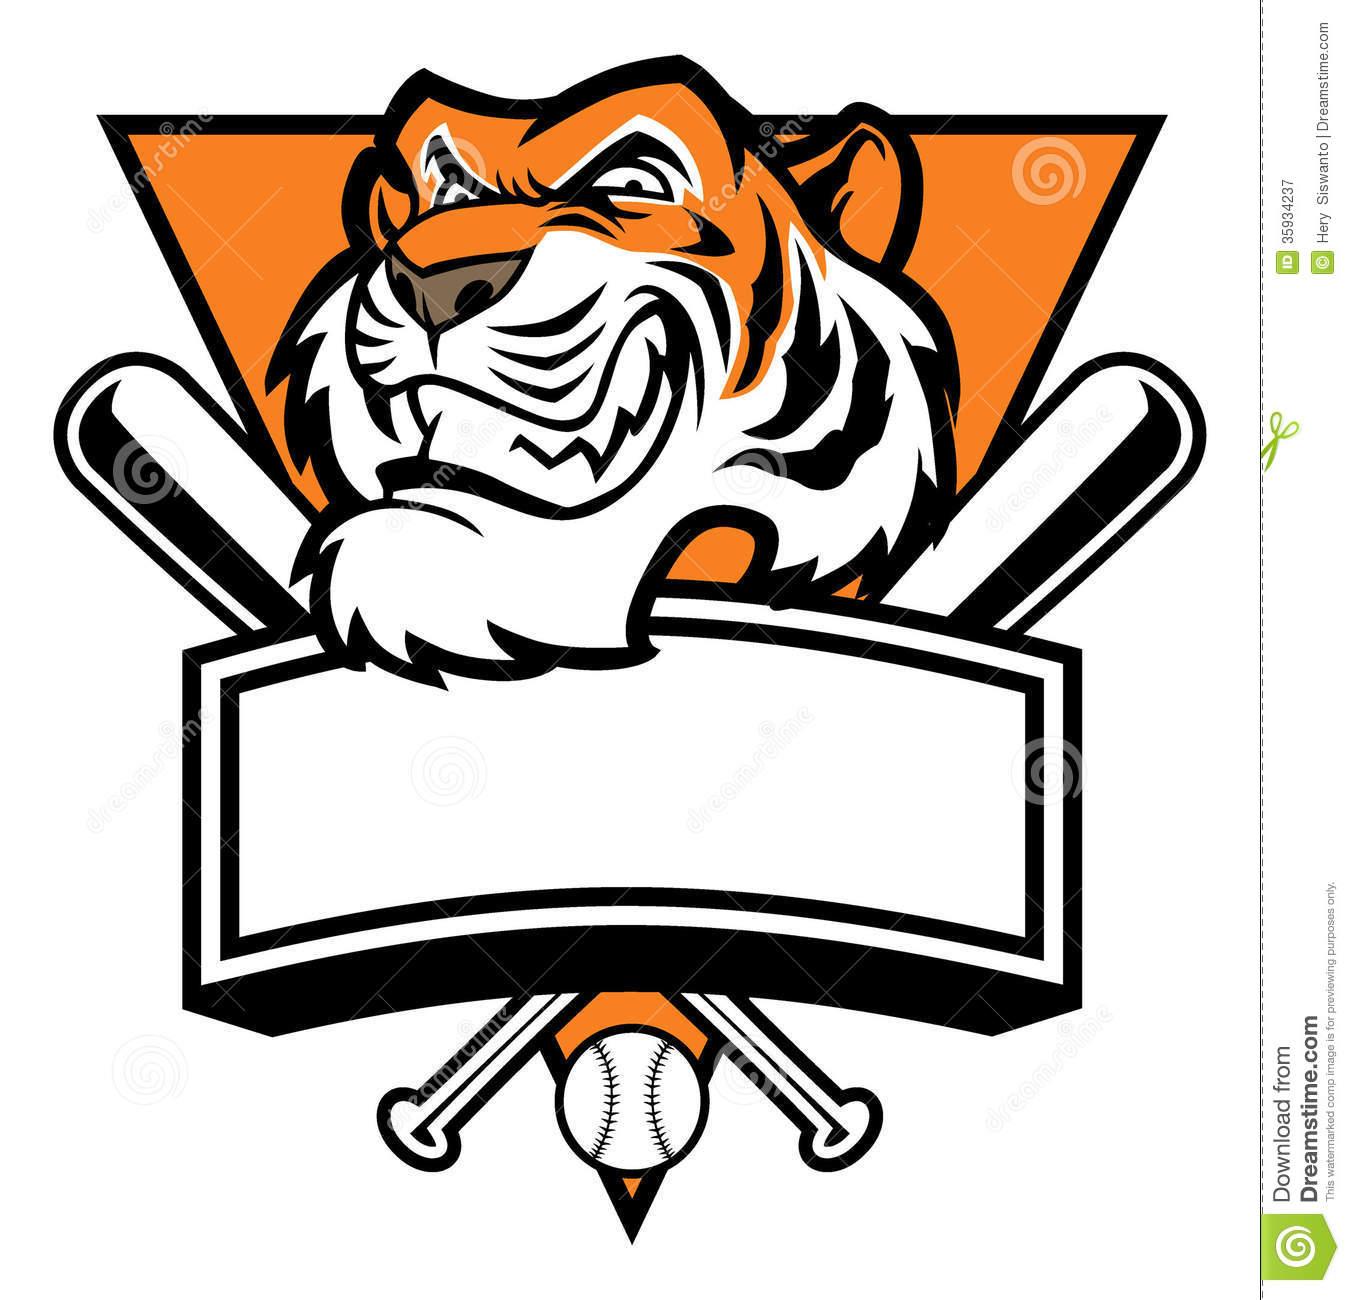 1350x1300 Clemson Tigers Mascot Clipart